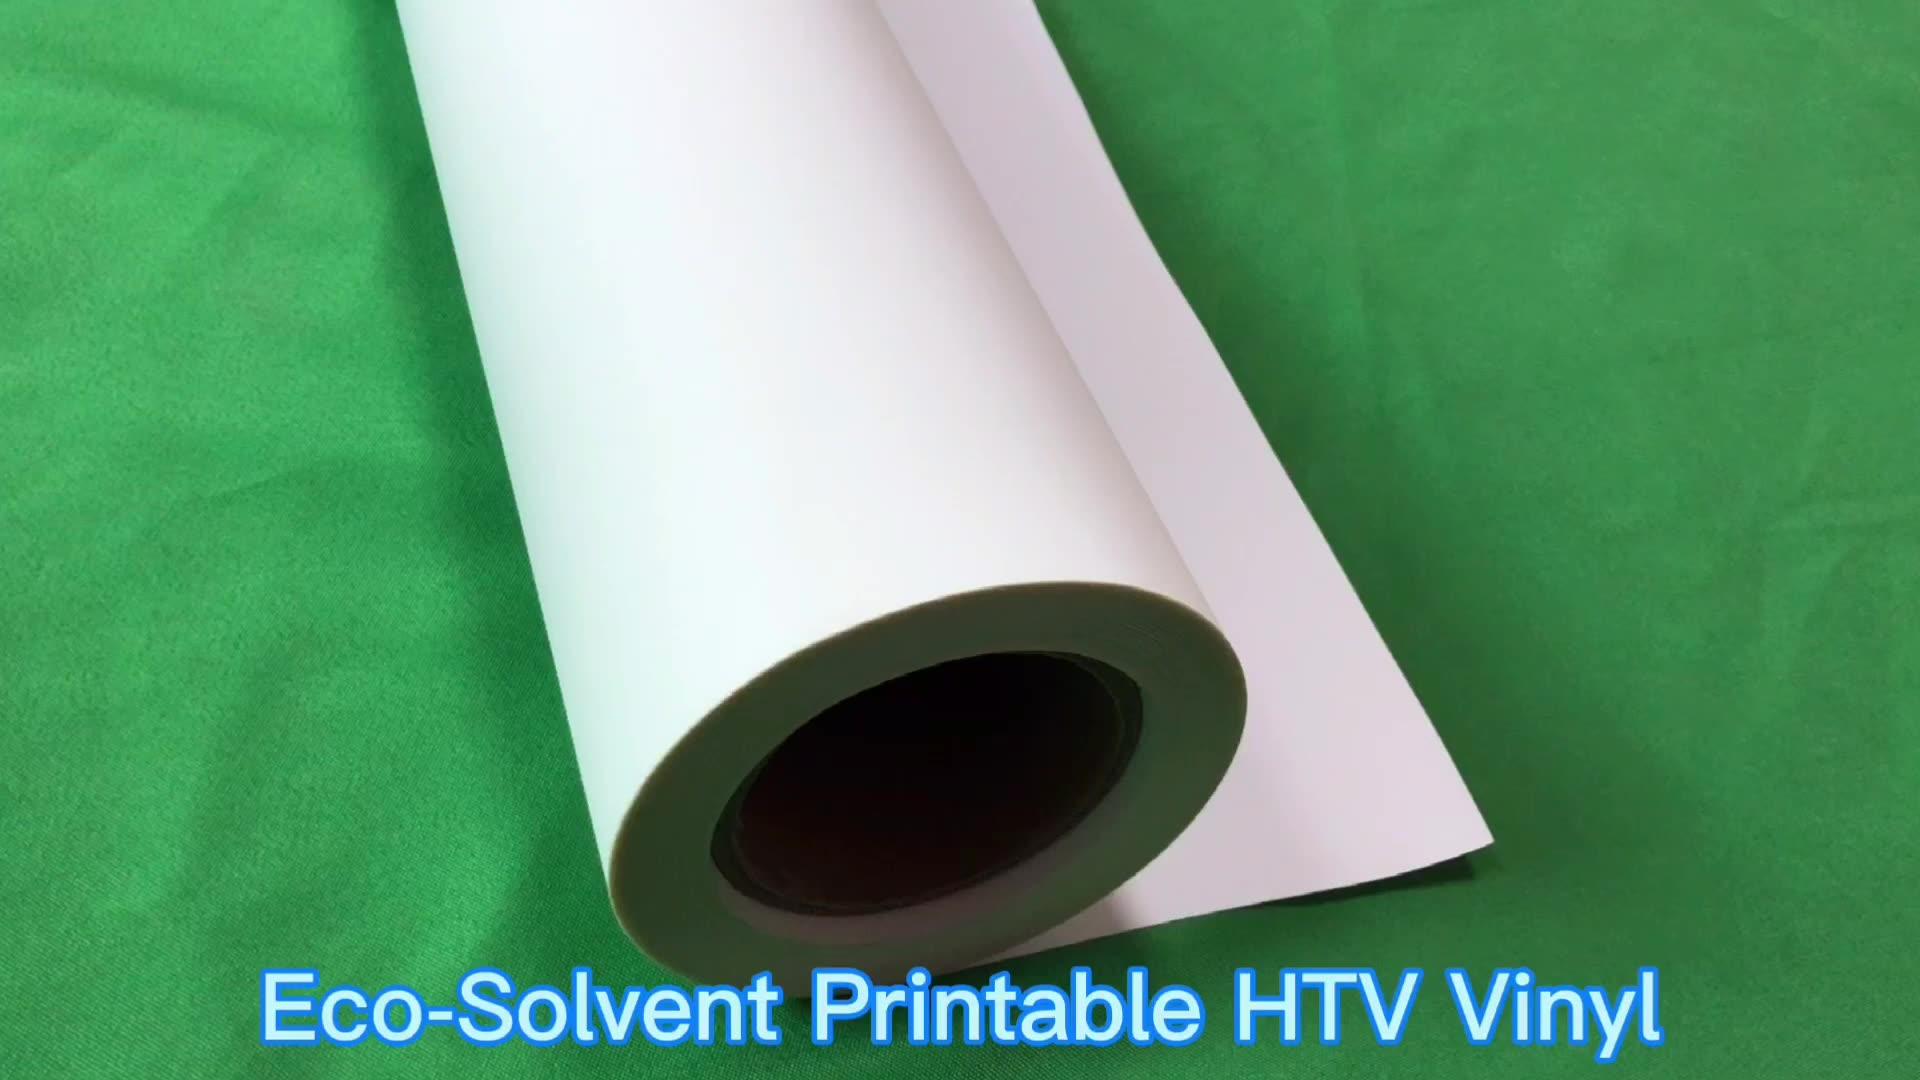 Eco solven printer PU heat transfer hydro printing film vinyl paper tissue inkjet for fabric clothing